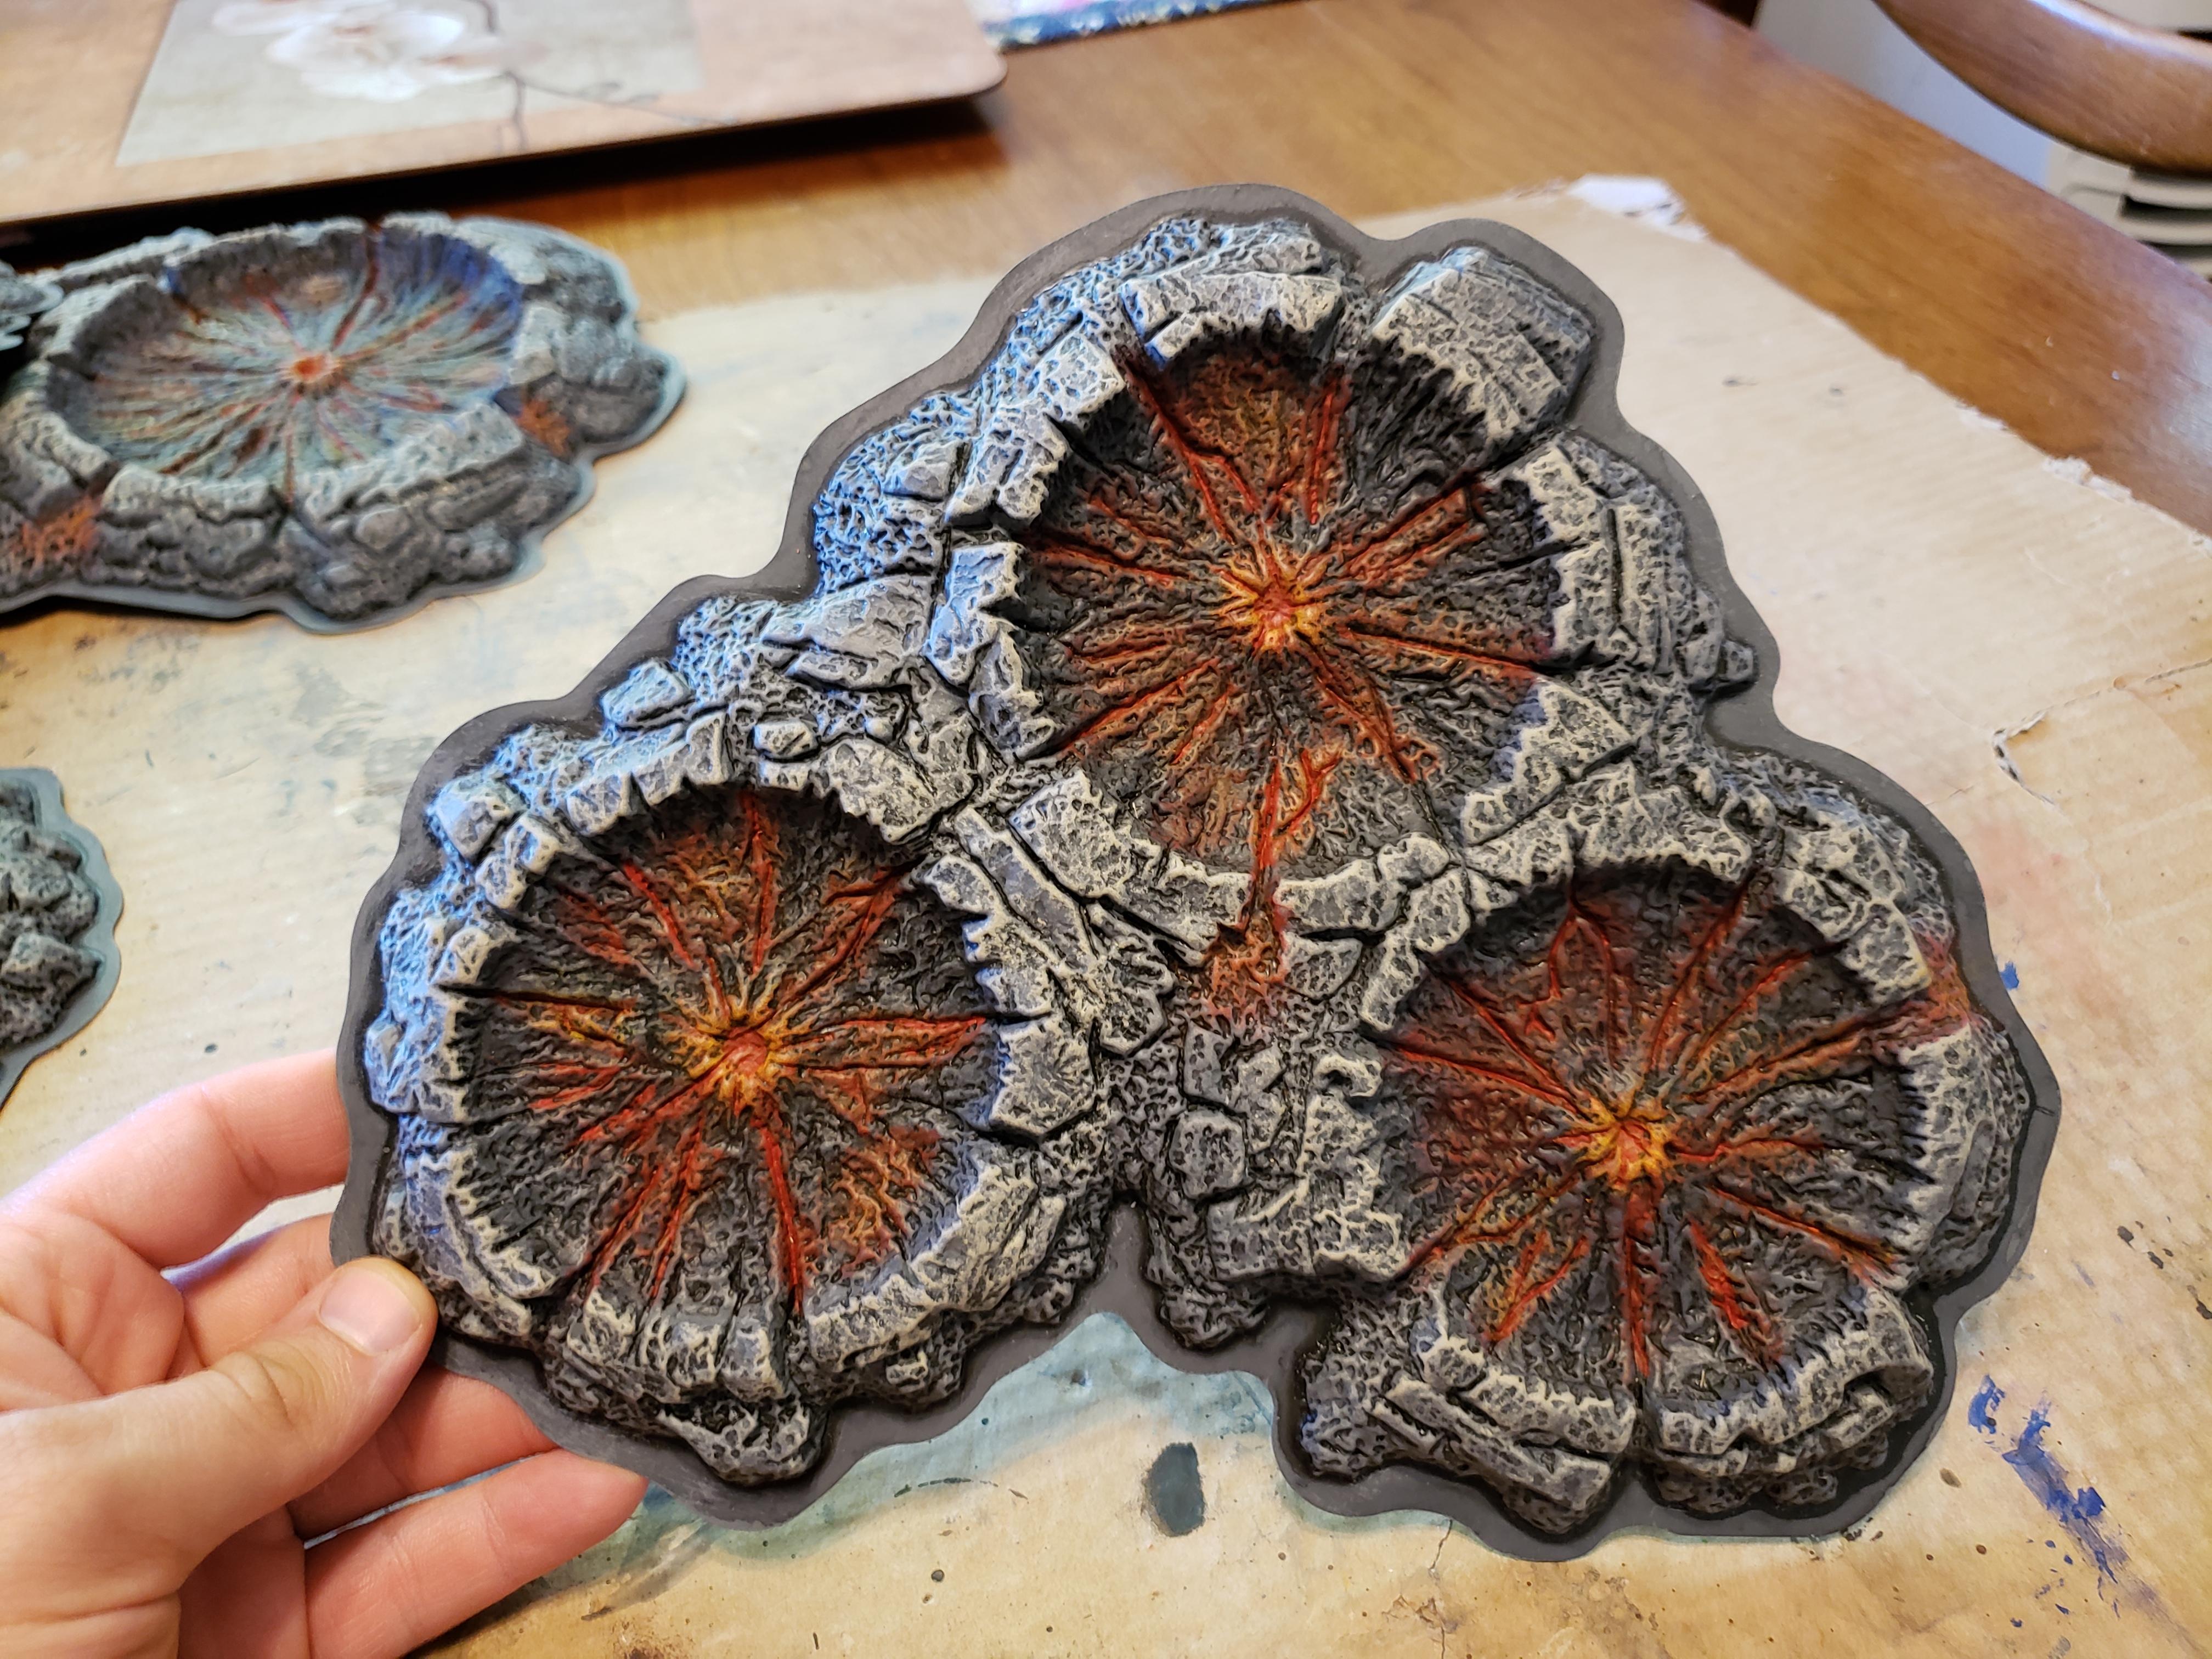 Craters, Terrain